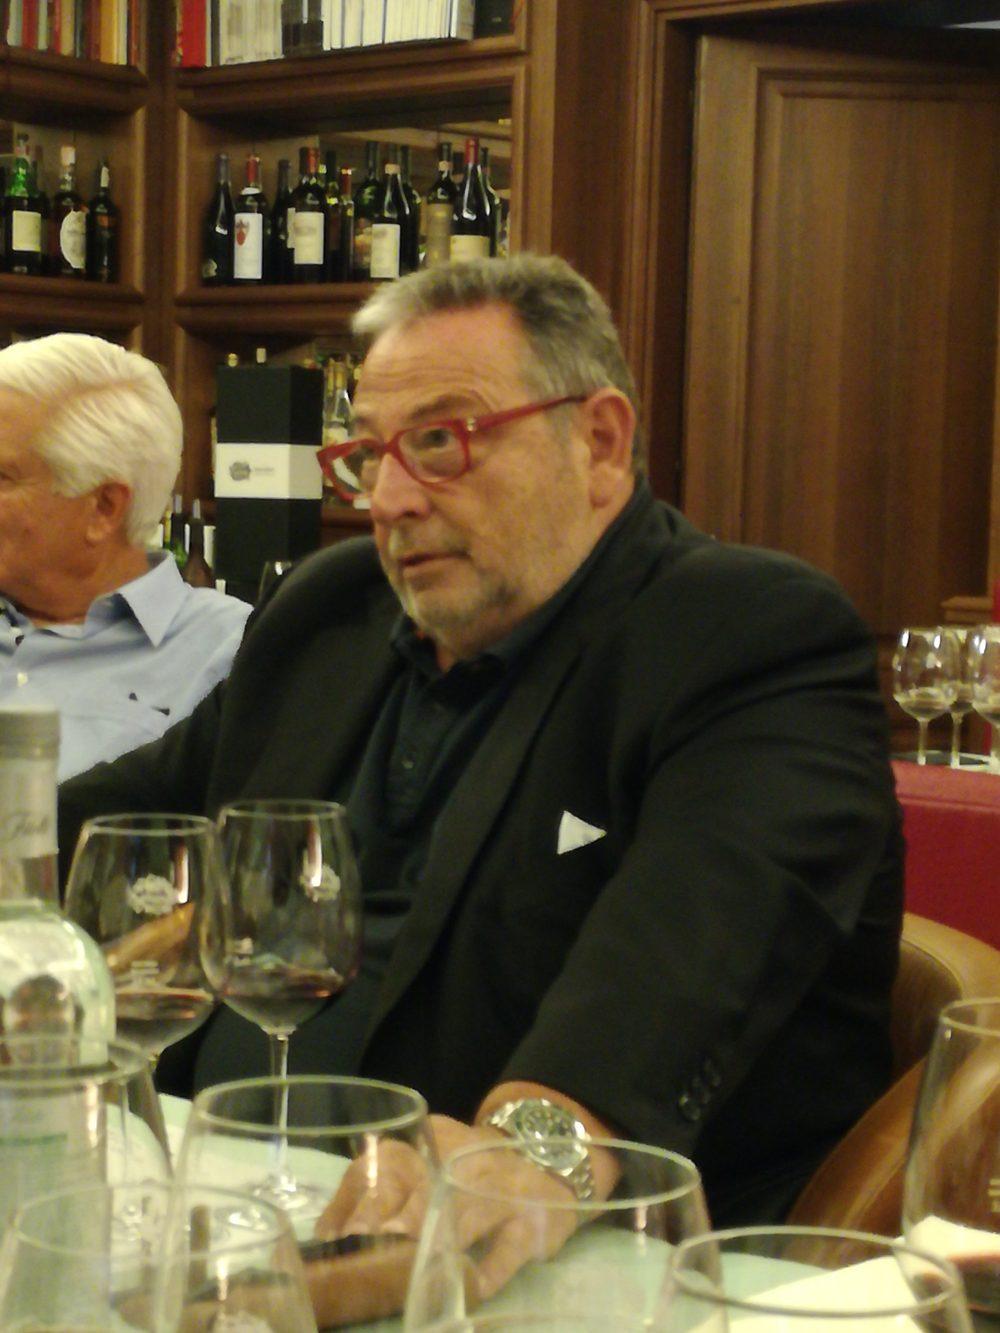 Fausto Maculan